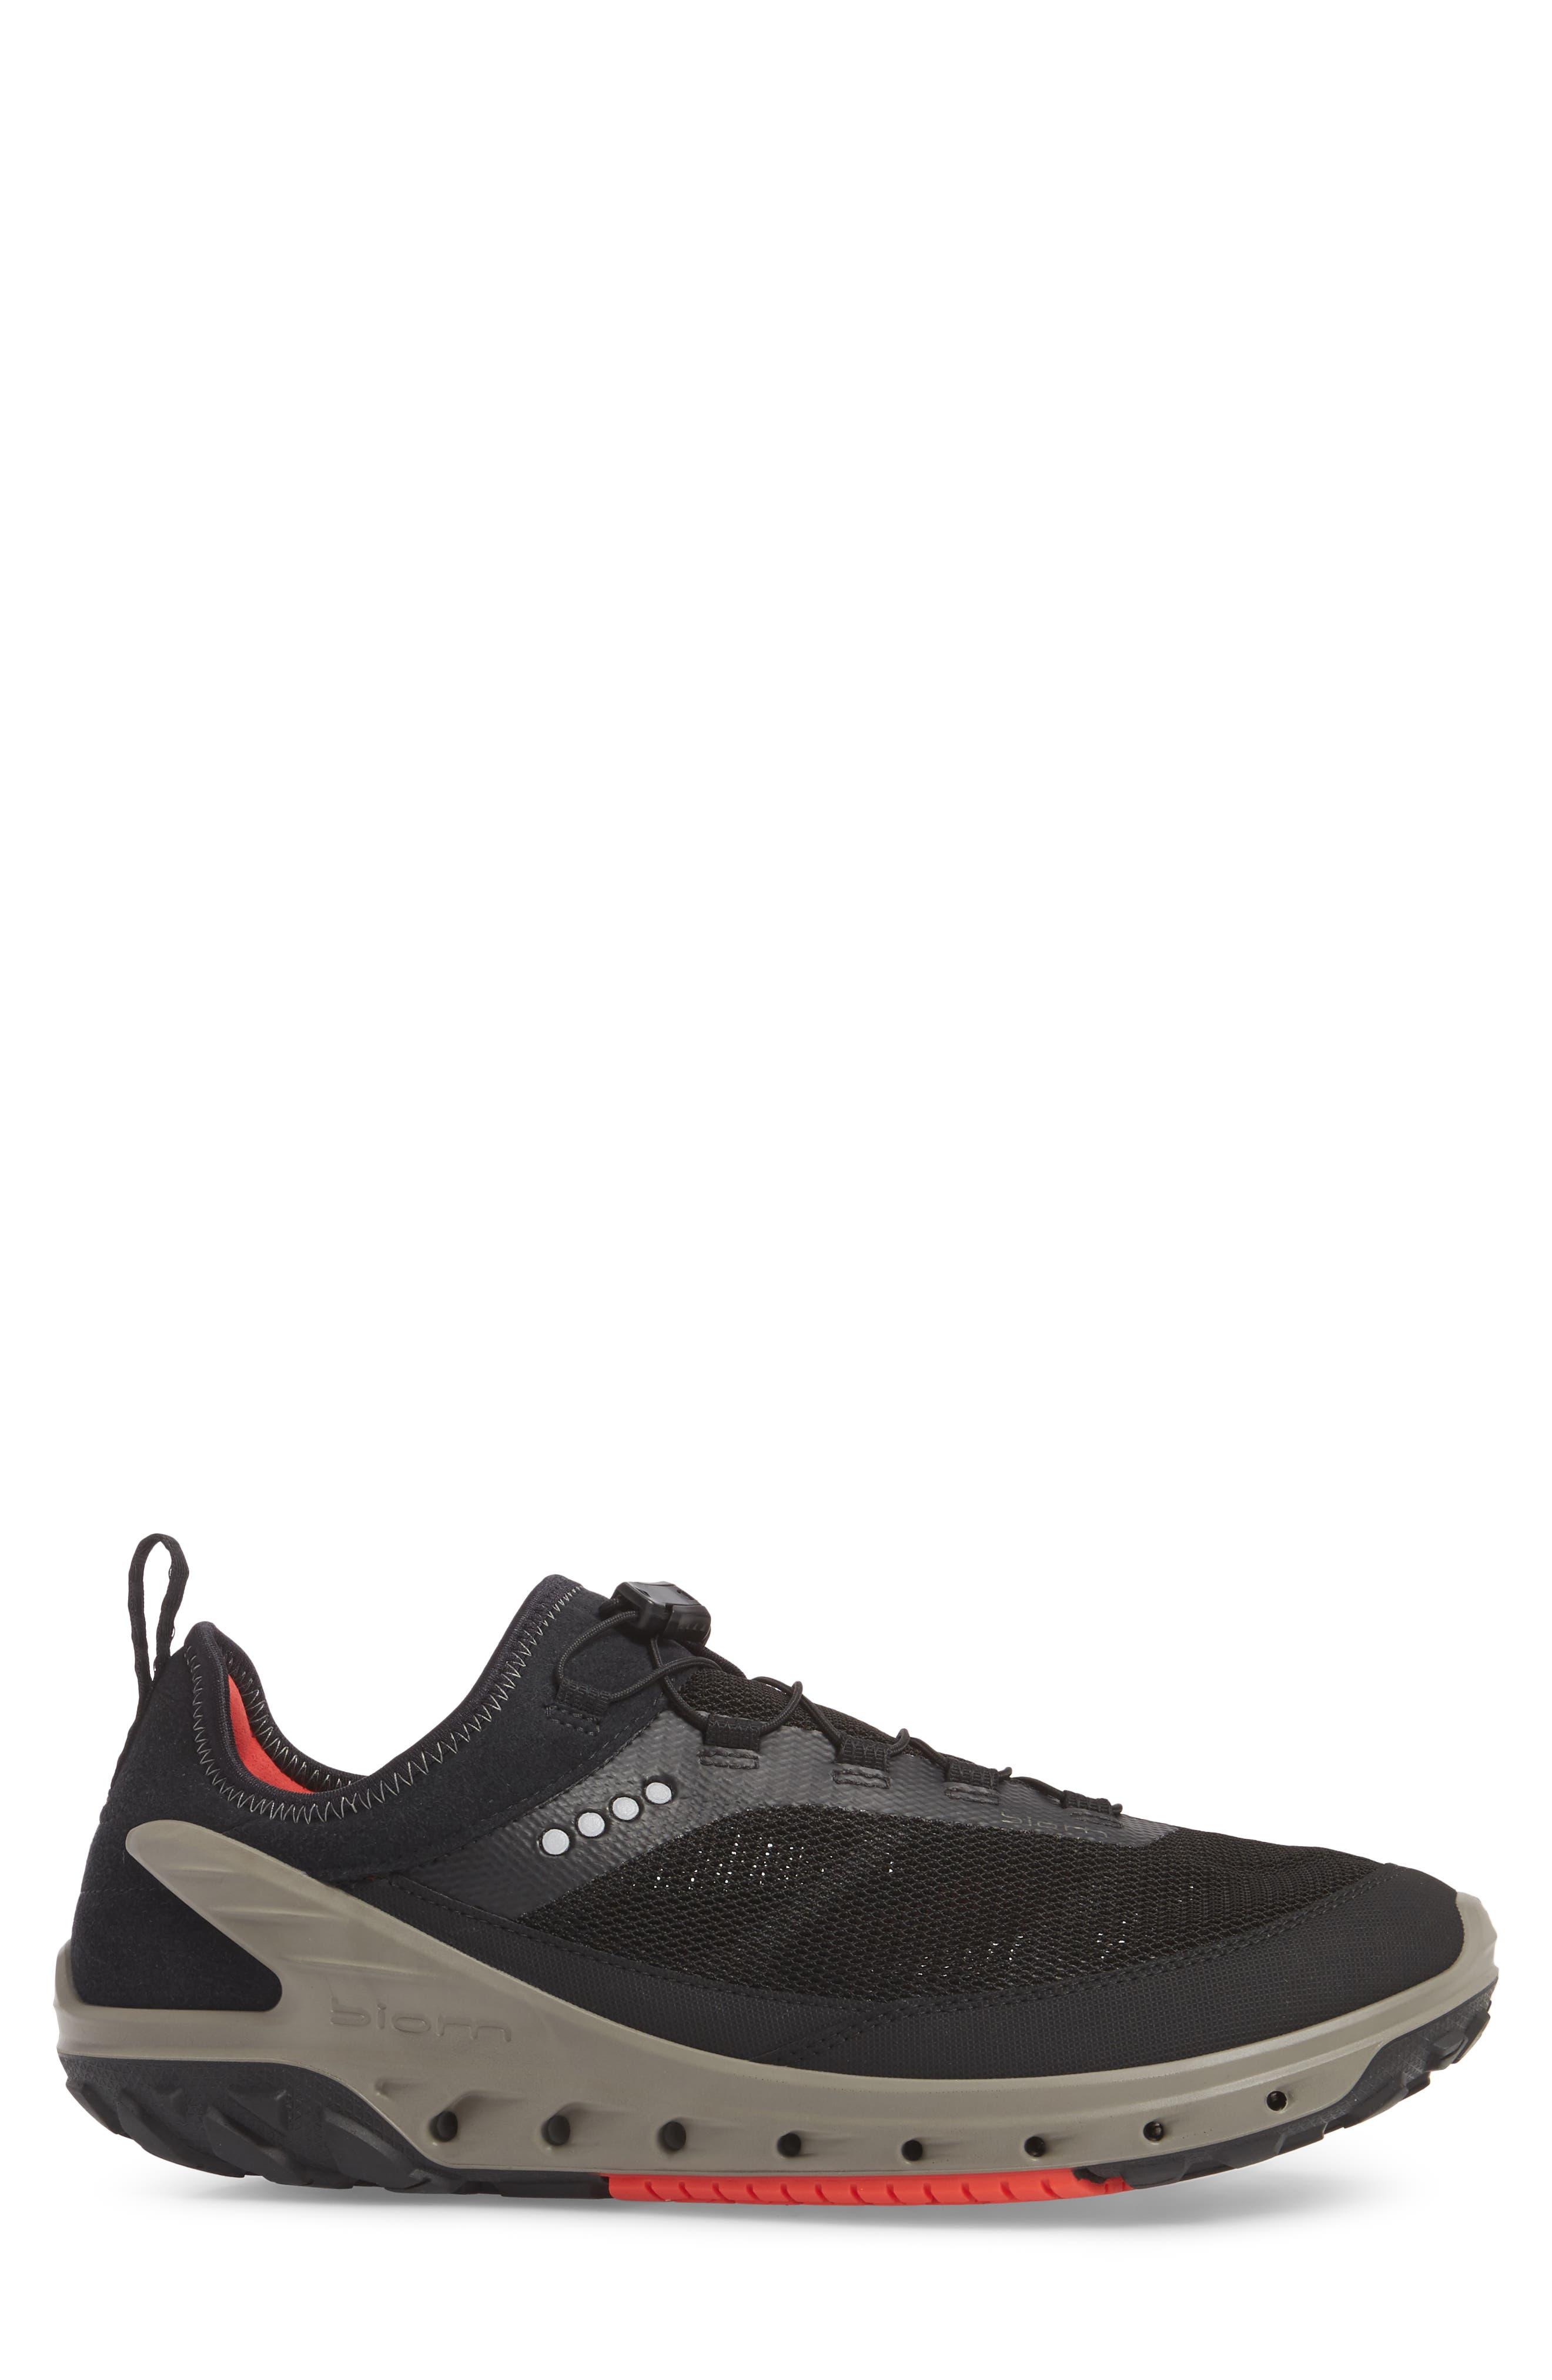 Biom Venture Sneaker,                             Alternate thumbnail 3, color,                             Black Leather